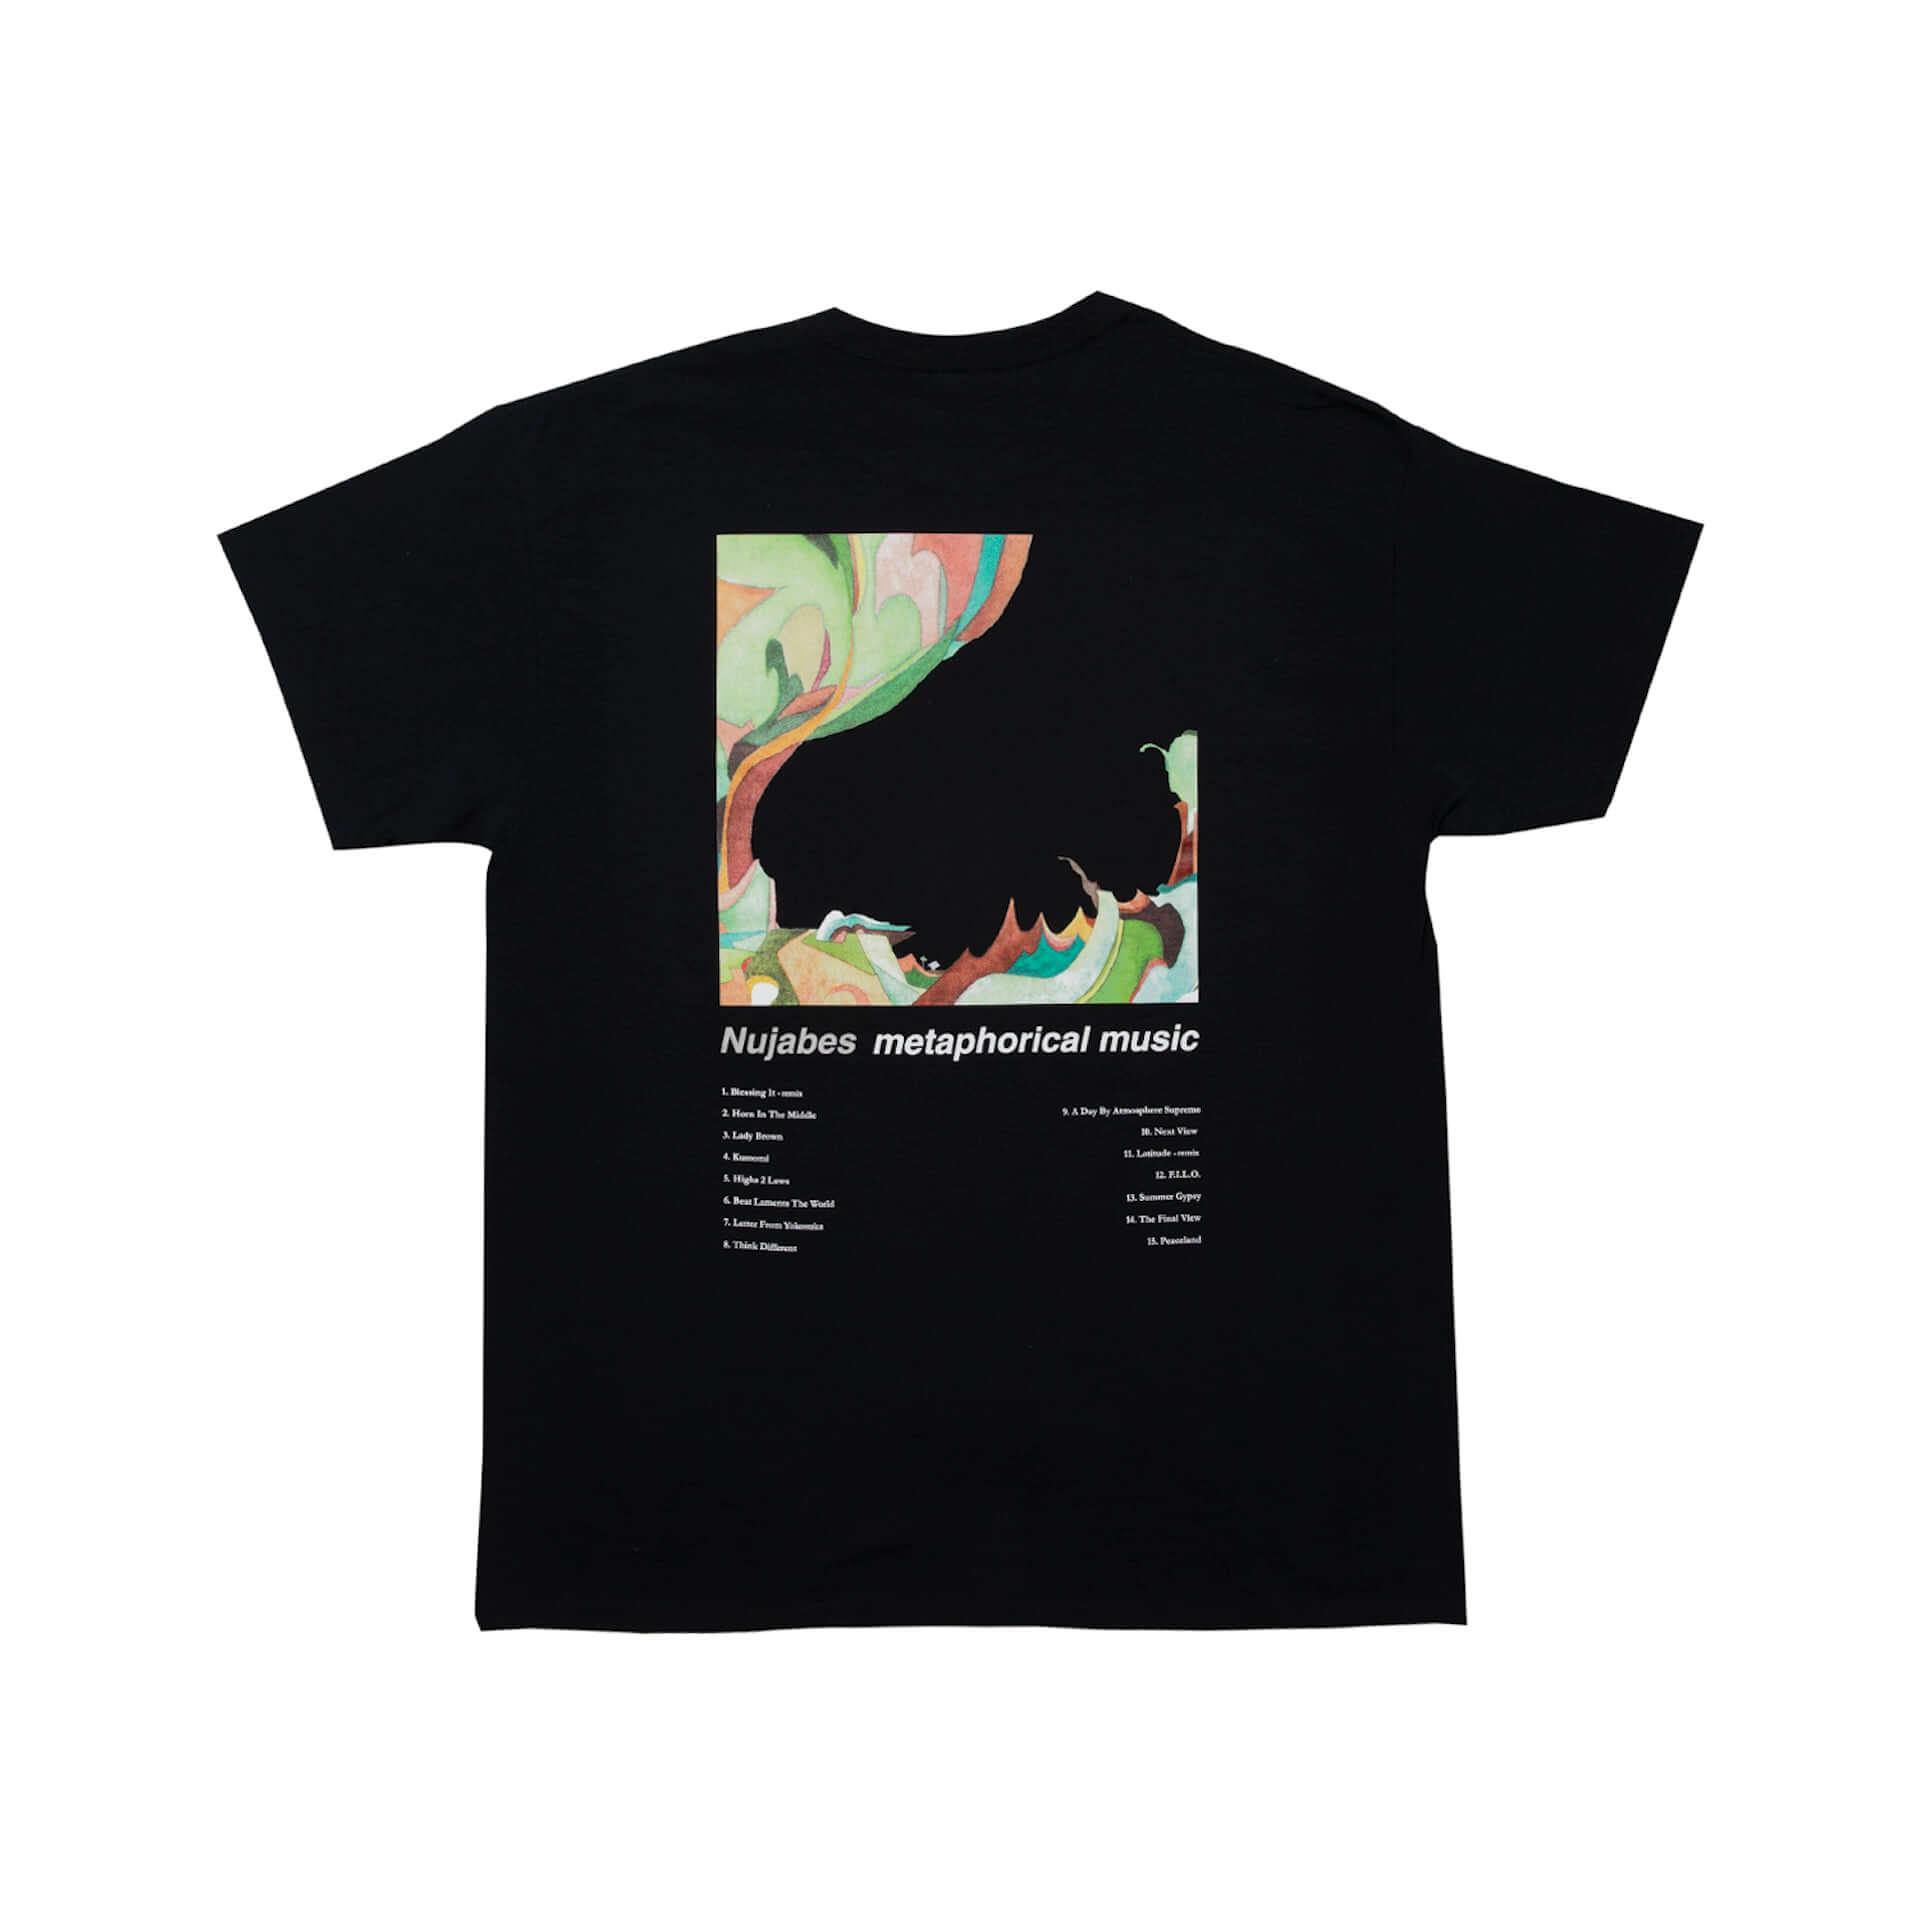 Nujabesの名盤『metaphorical music』ジャケットが施されたTシャツやフーディーなど続々登場!ポップアップ最新グッズの予約受付が開始 lf210205_nujabes_6-1920x1920